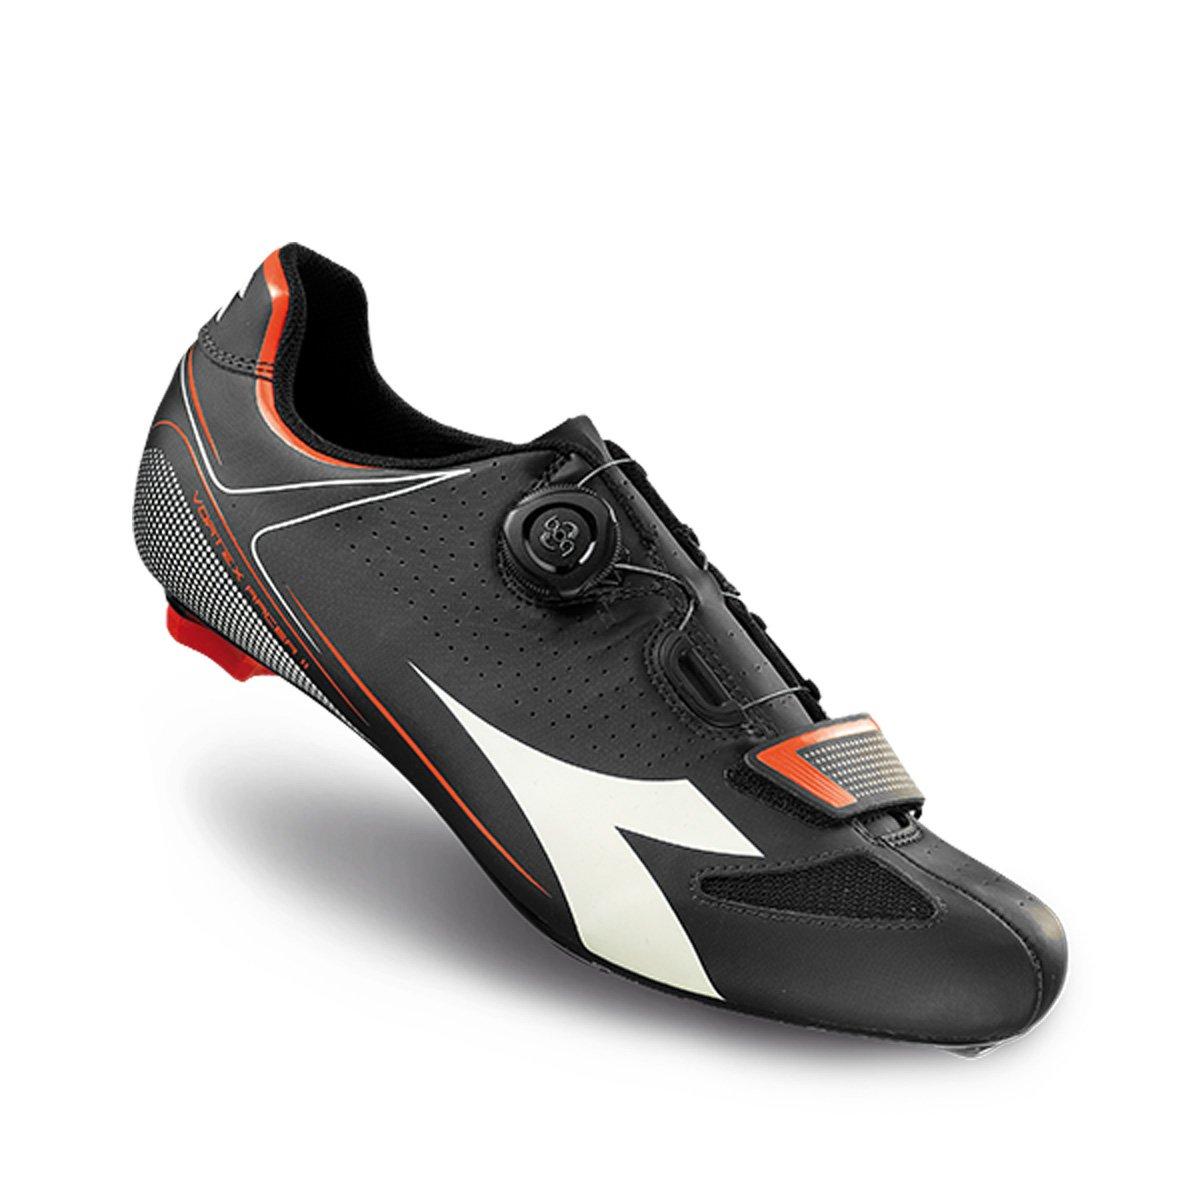 Diadora Men 's vortex-racer IIロードサイクリング靴 – 170218-c4114 44 Black/White/Fluo Red B01NA7DUOF